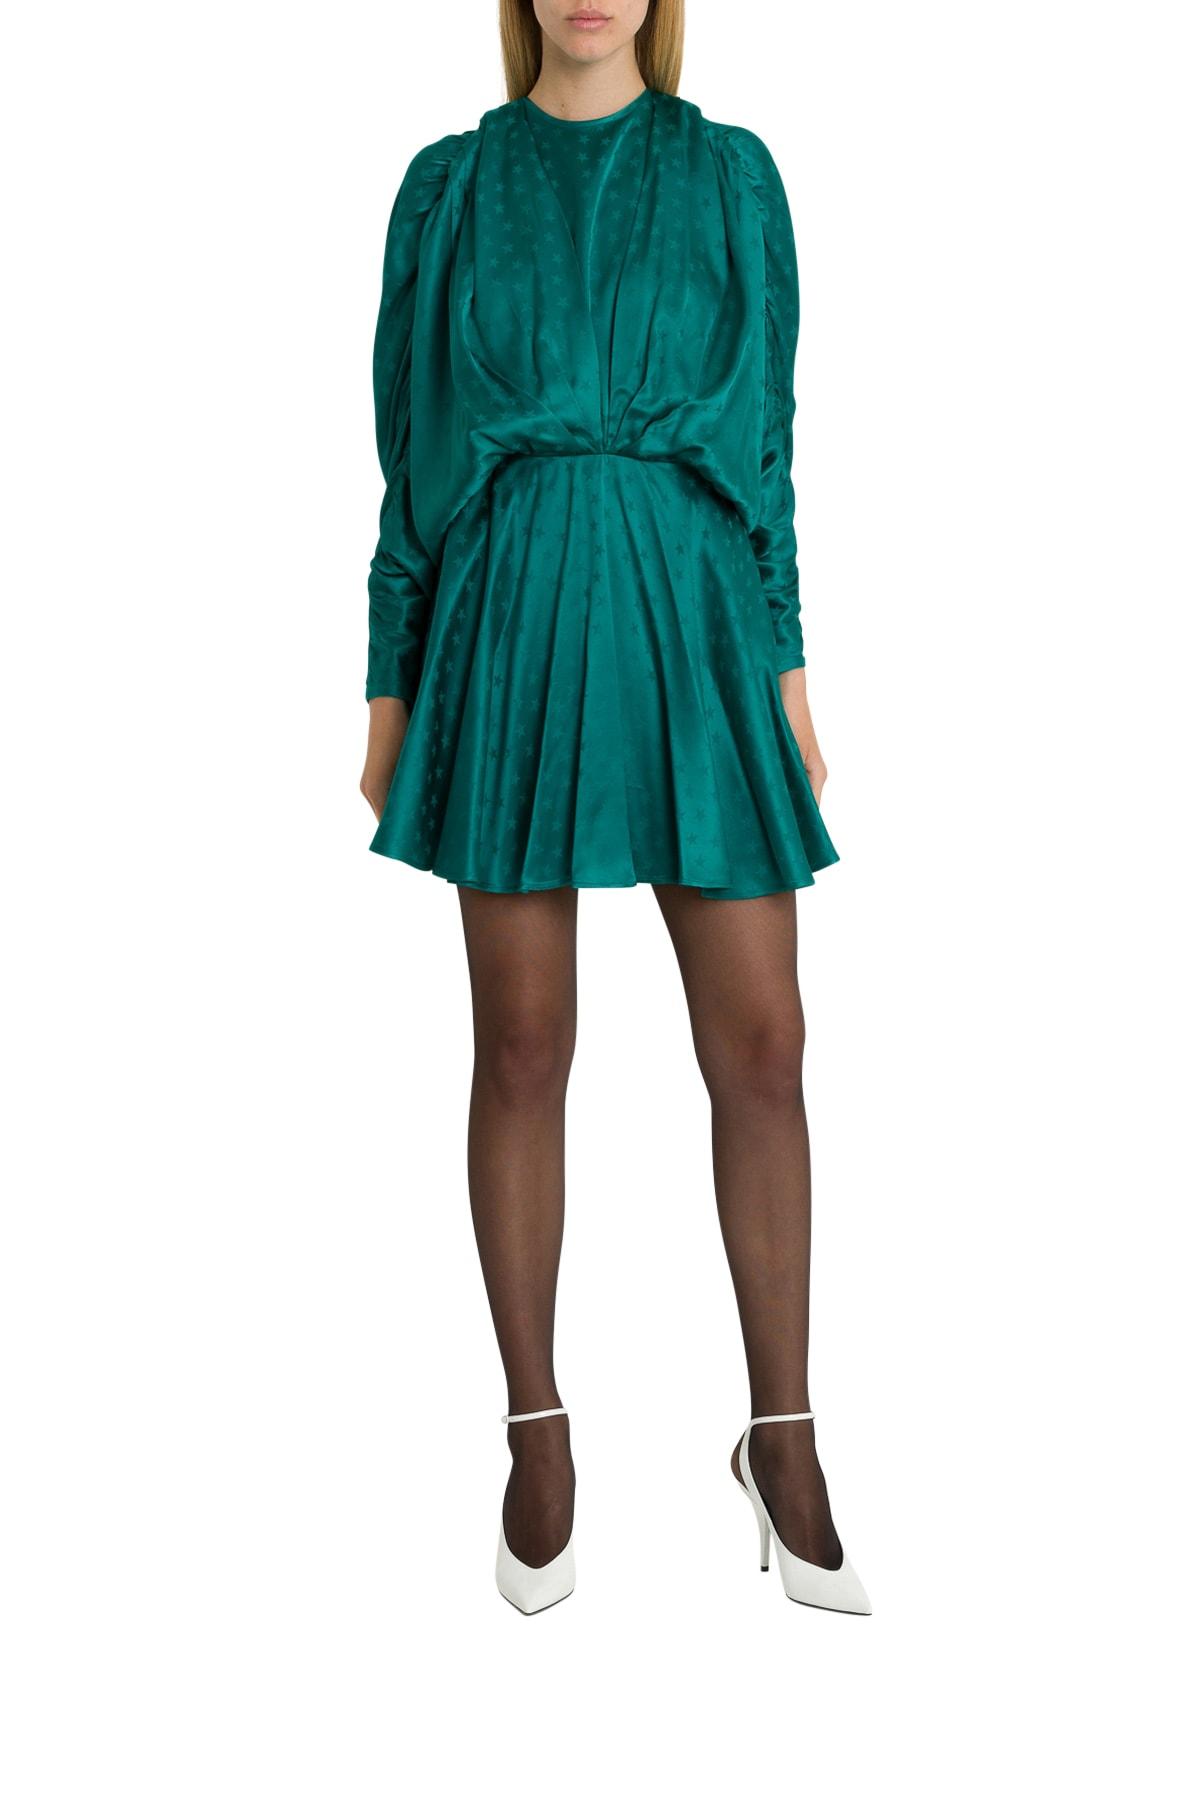 The Attico Jacquard Satin Mini Dress